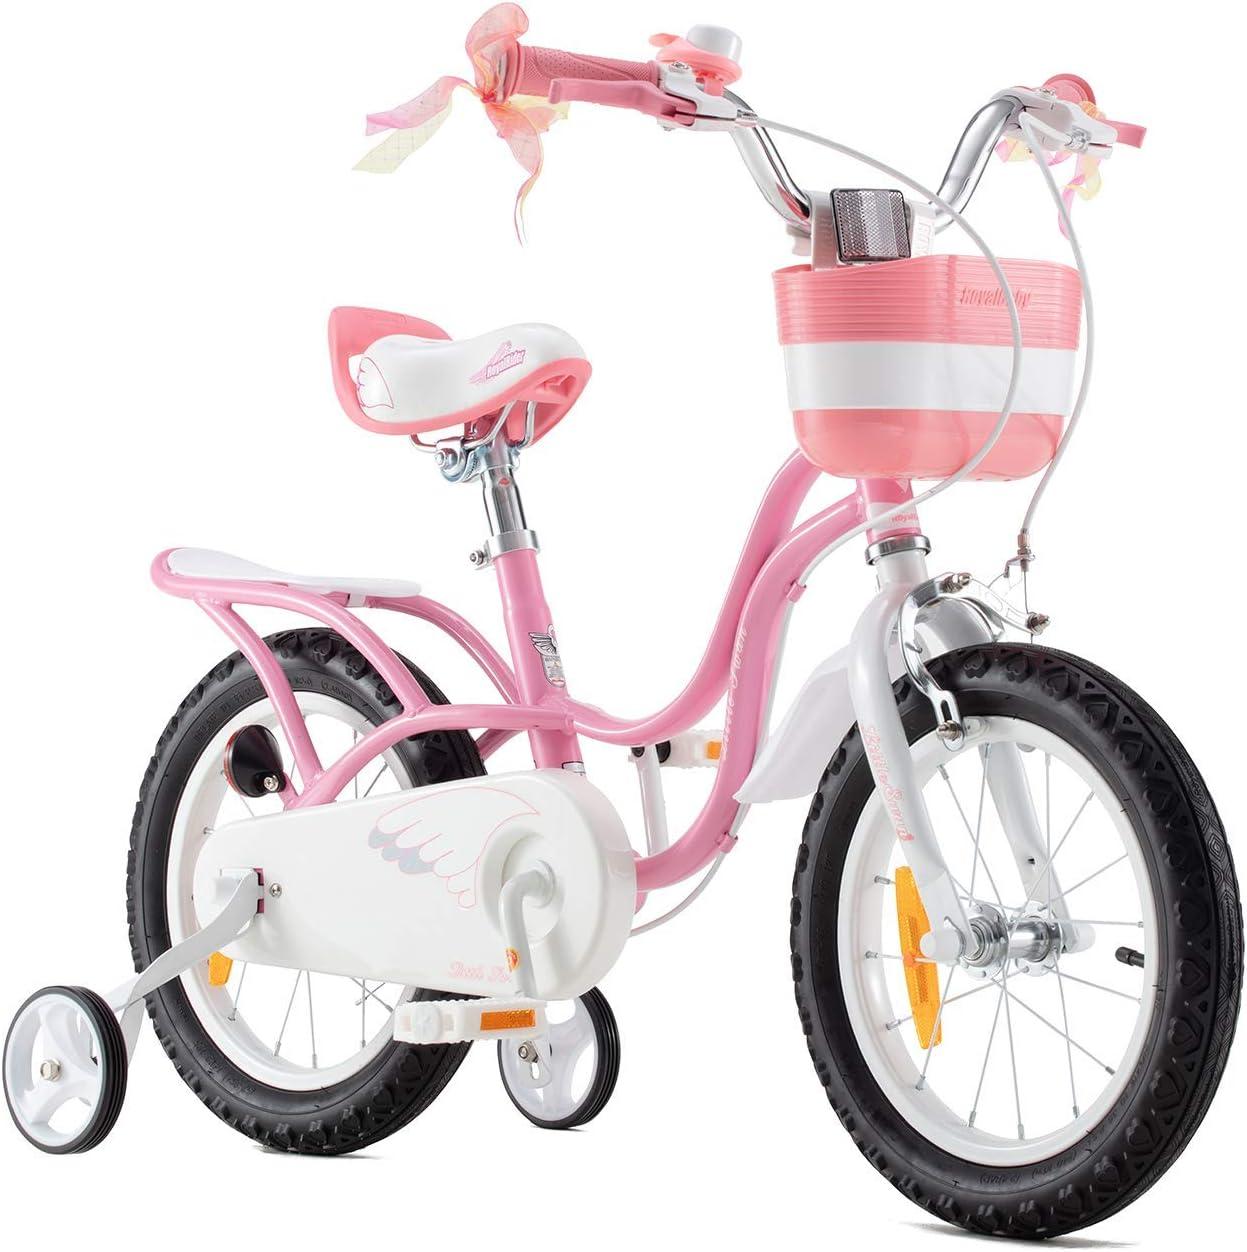 RoyalBaby Bicicleta para niños niña 3-9 años Little Swan 12 14 16 18 Pulgadas Ruedas auxiliares Bicicletas Infantiles Bicicleta de Niño